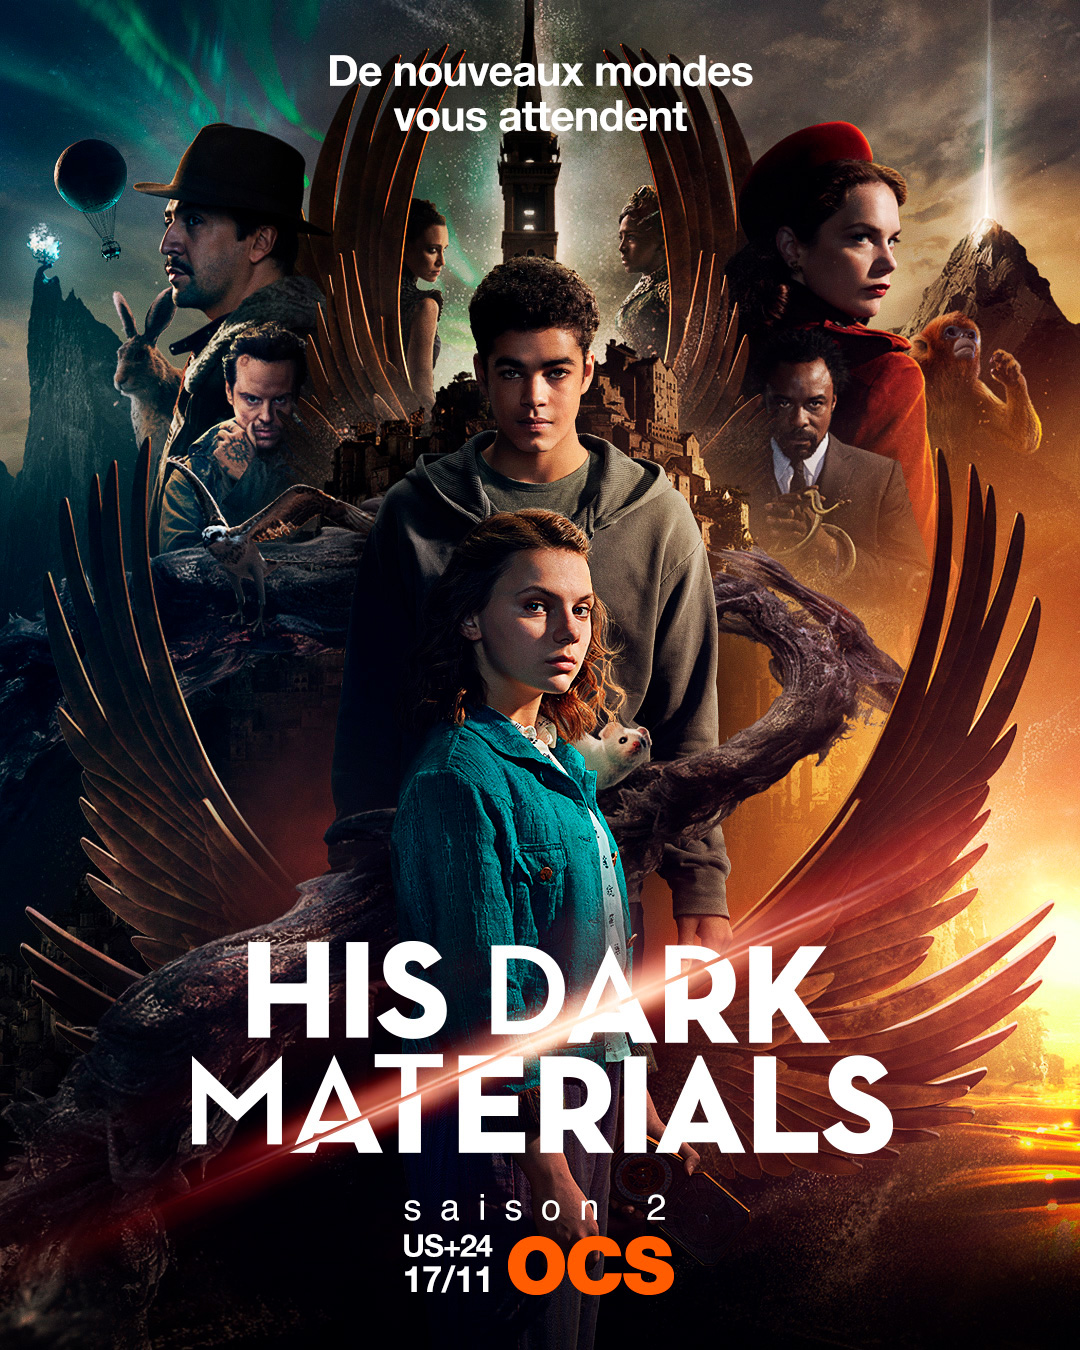 His Dark Materials Saison 1 Streaming : materials, saison, streaming, Materials, Croisée, Mondes, Saison, AlloCiné